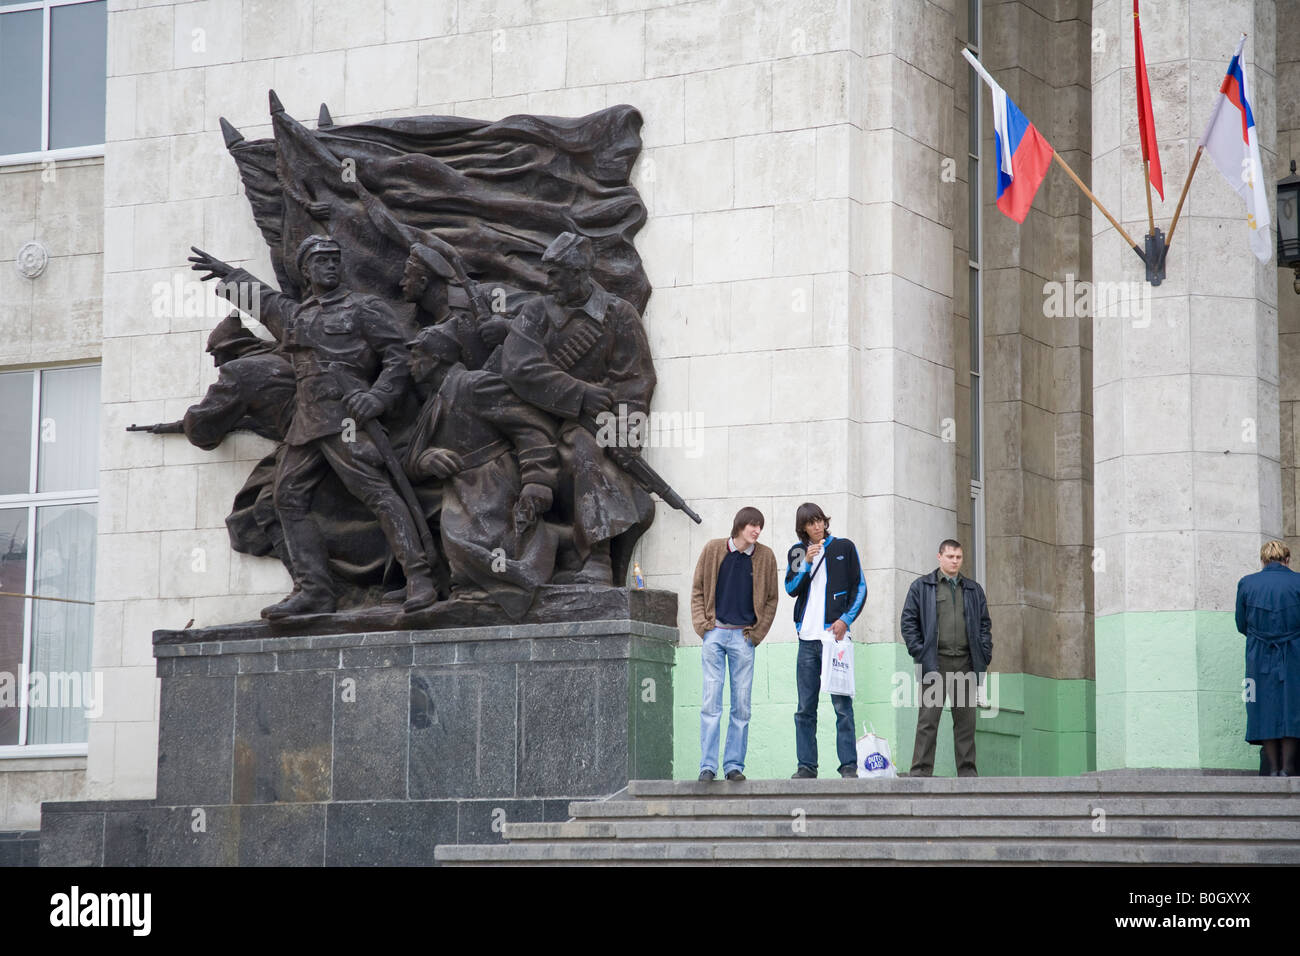 Relief bronze statue of Great Patriotic War on front on Volgograd Railway Station, Volgograd (formerly Stalingrad), - Stock Image